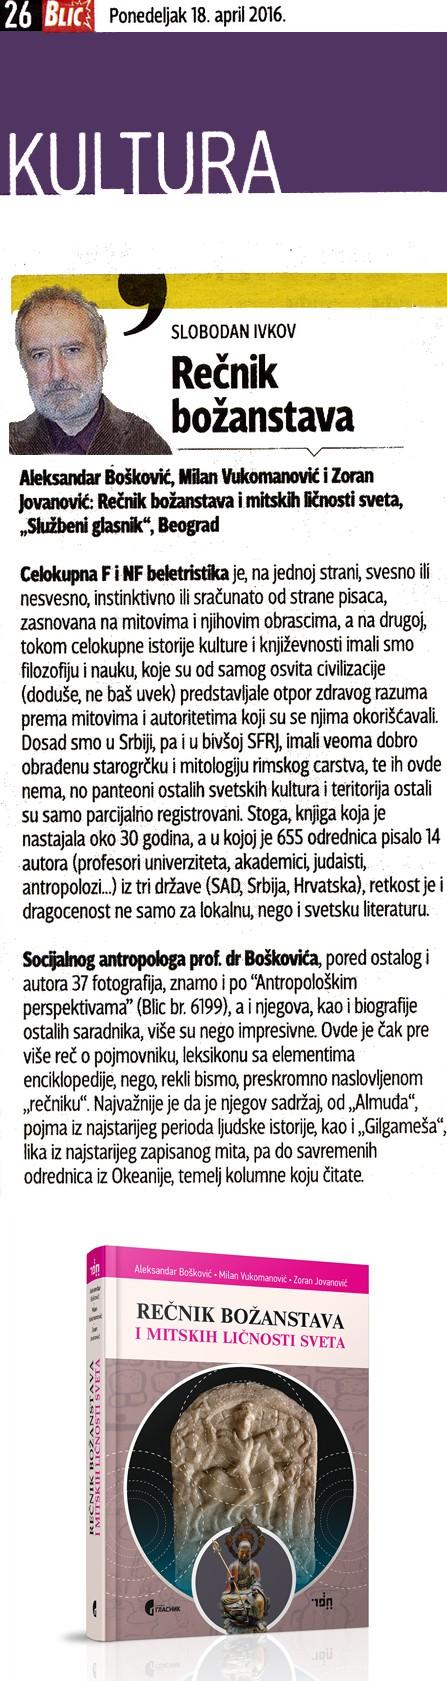 Aleksandar Bošković, Milan Vukomanović i Zoran Jovanović – REČNIK BOŽANSTAVA